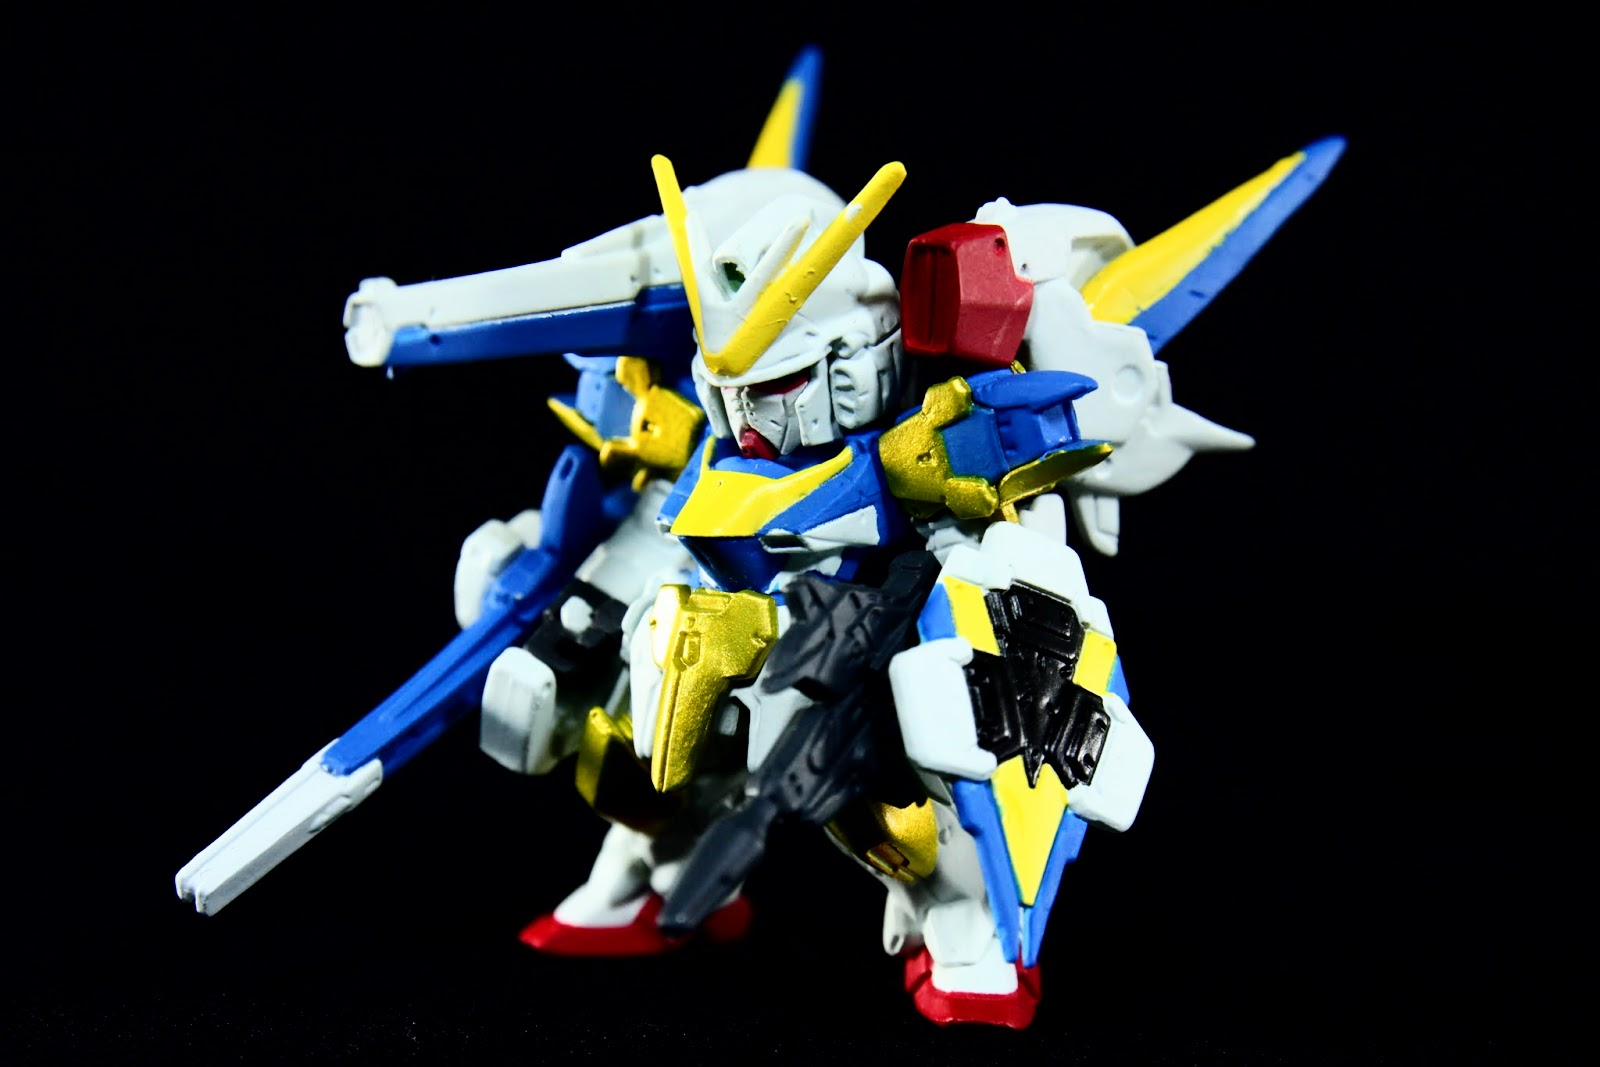 變成UC史上最強的: V2-Assault Buster Gundam